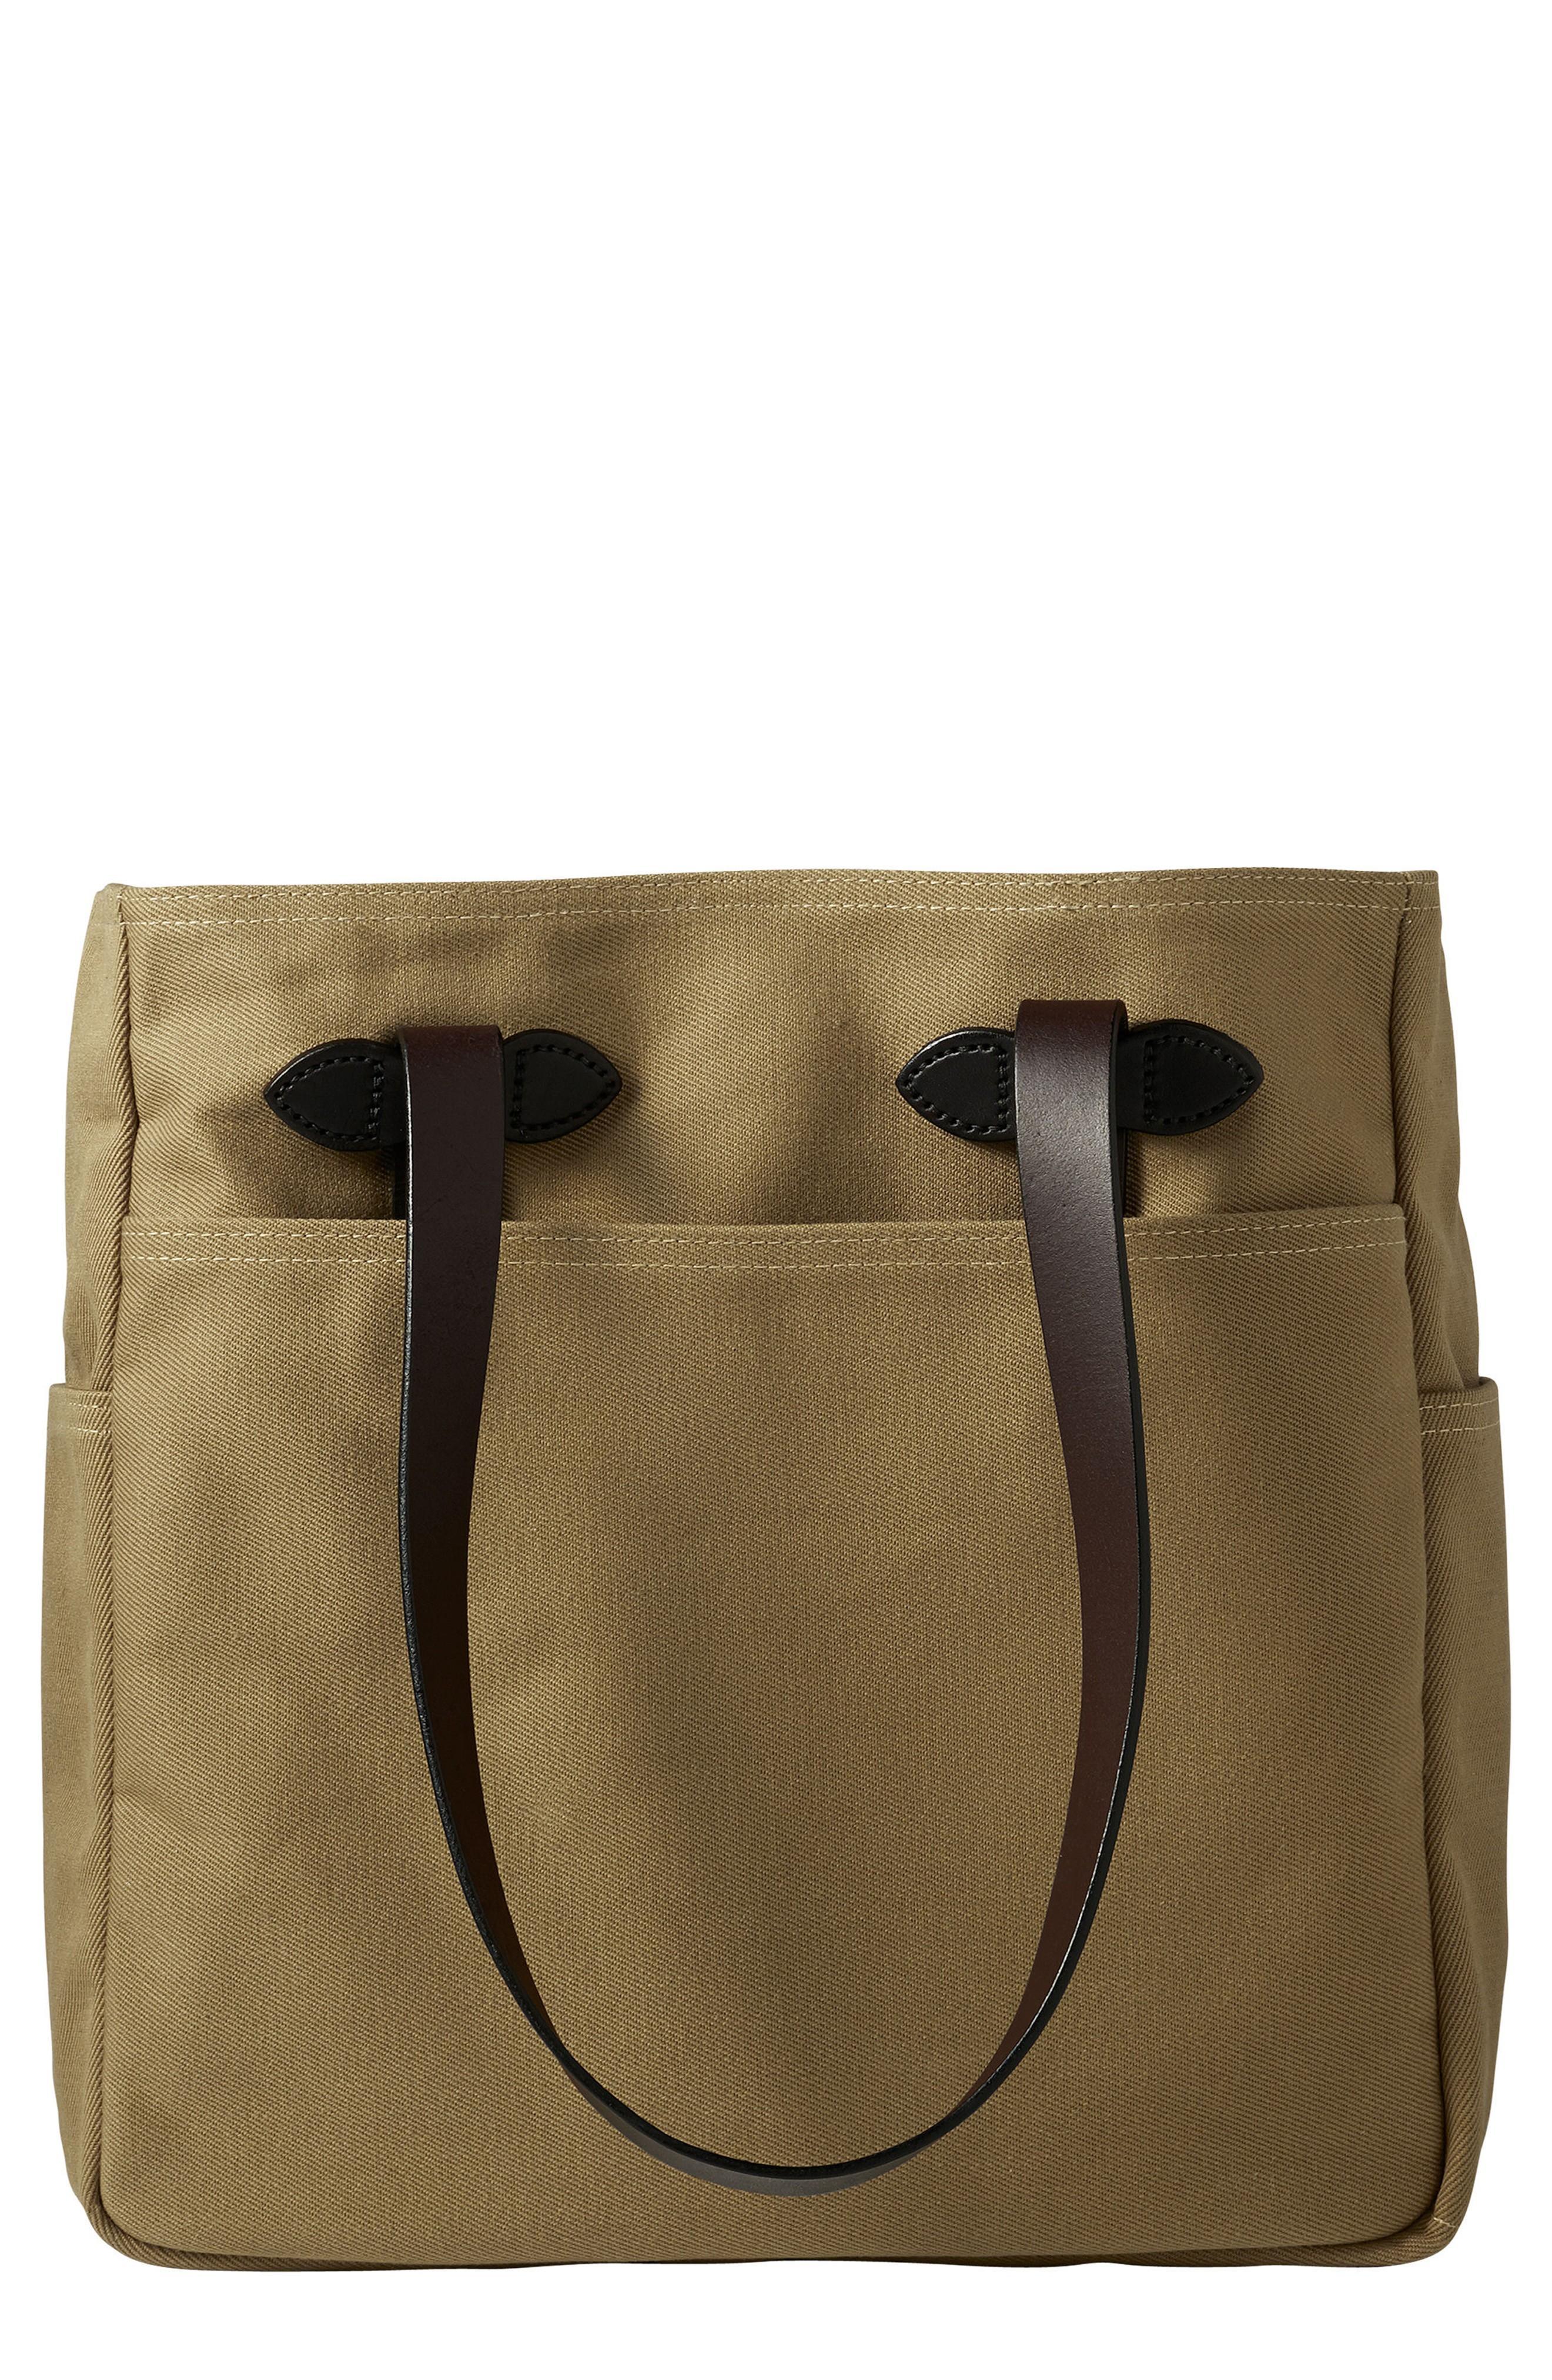 Filson Rugged Twill Tote Bag In Tan